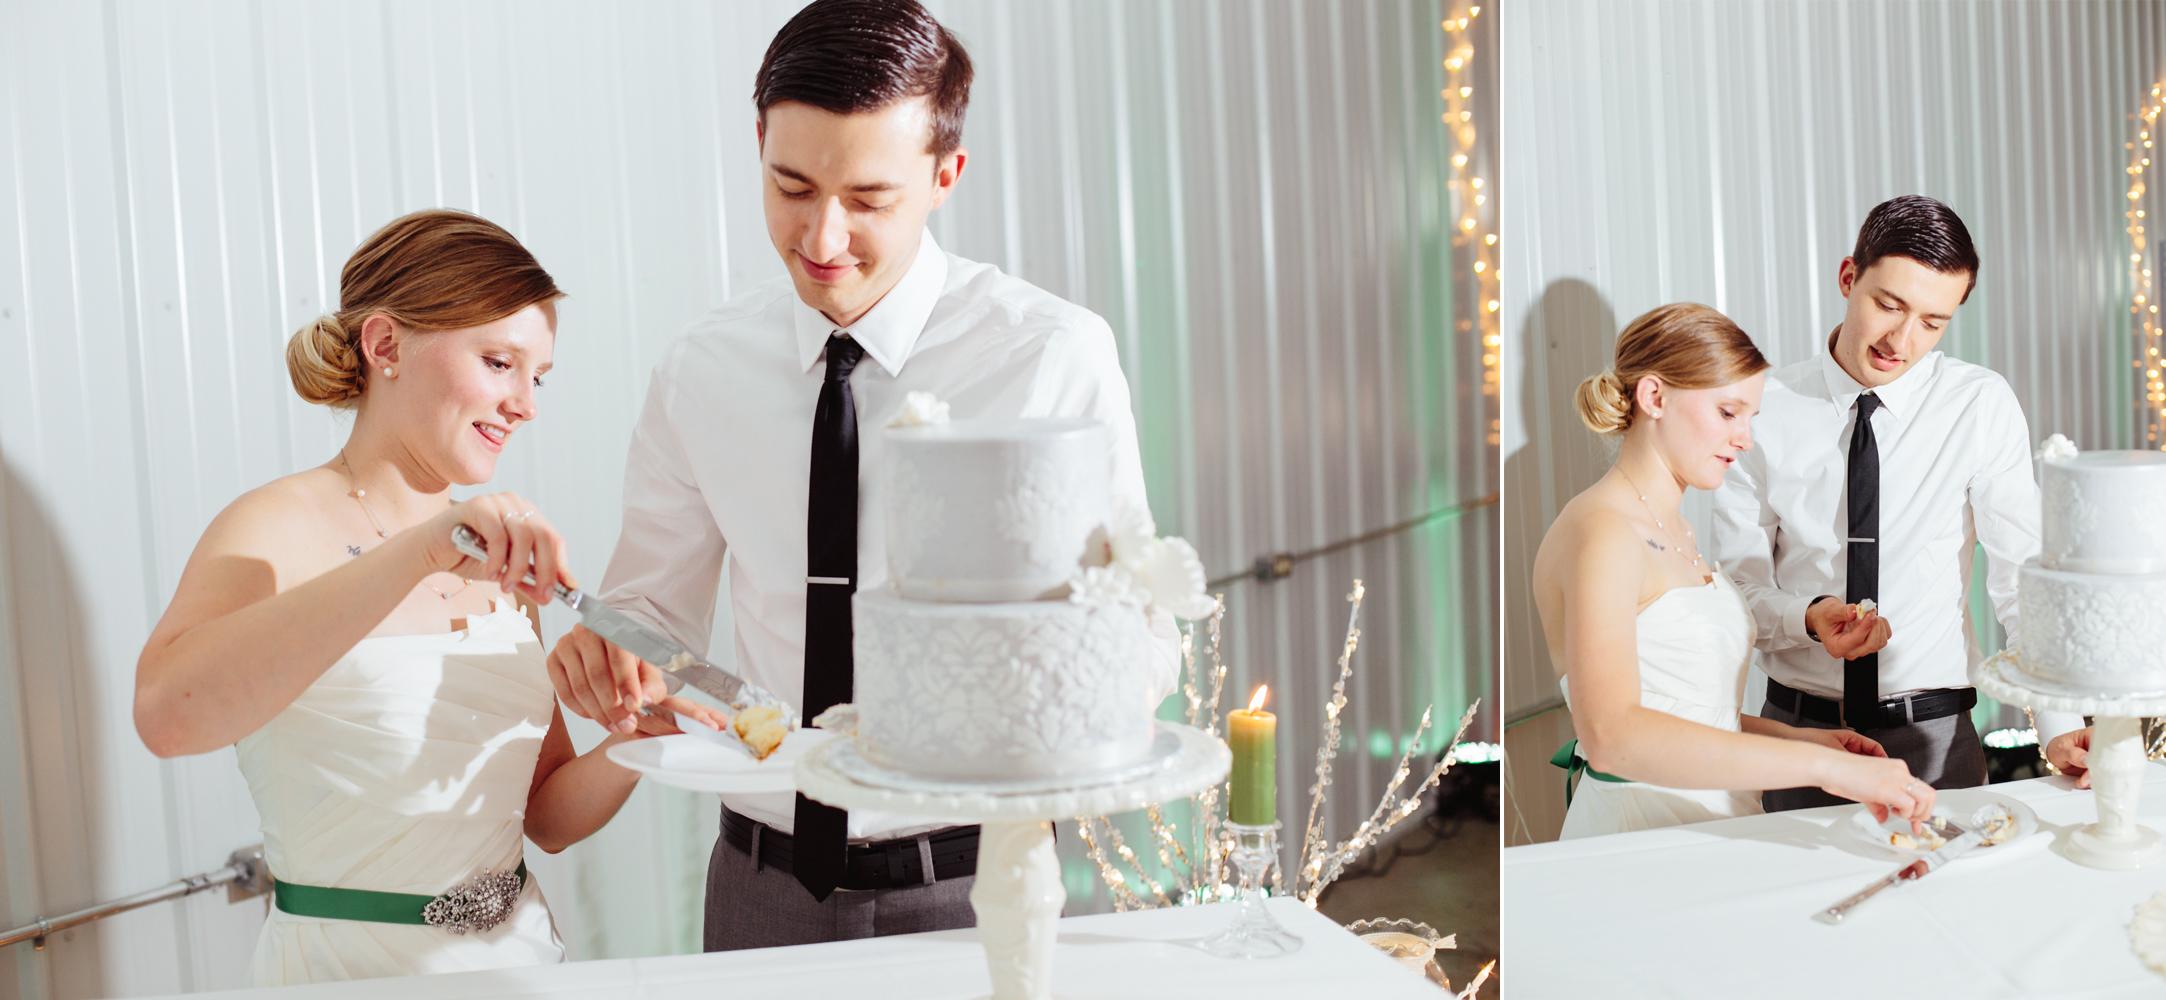 South-Dakota-Intimate-Wedding-38.jpg